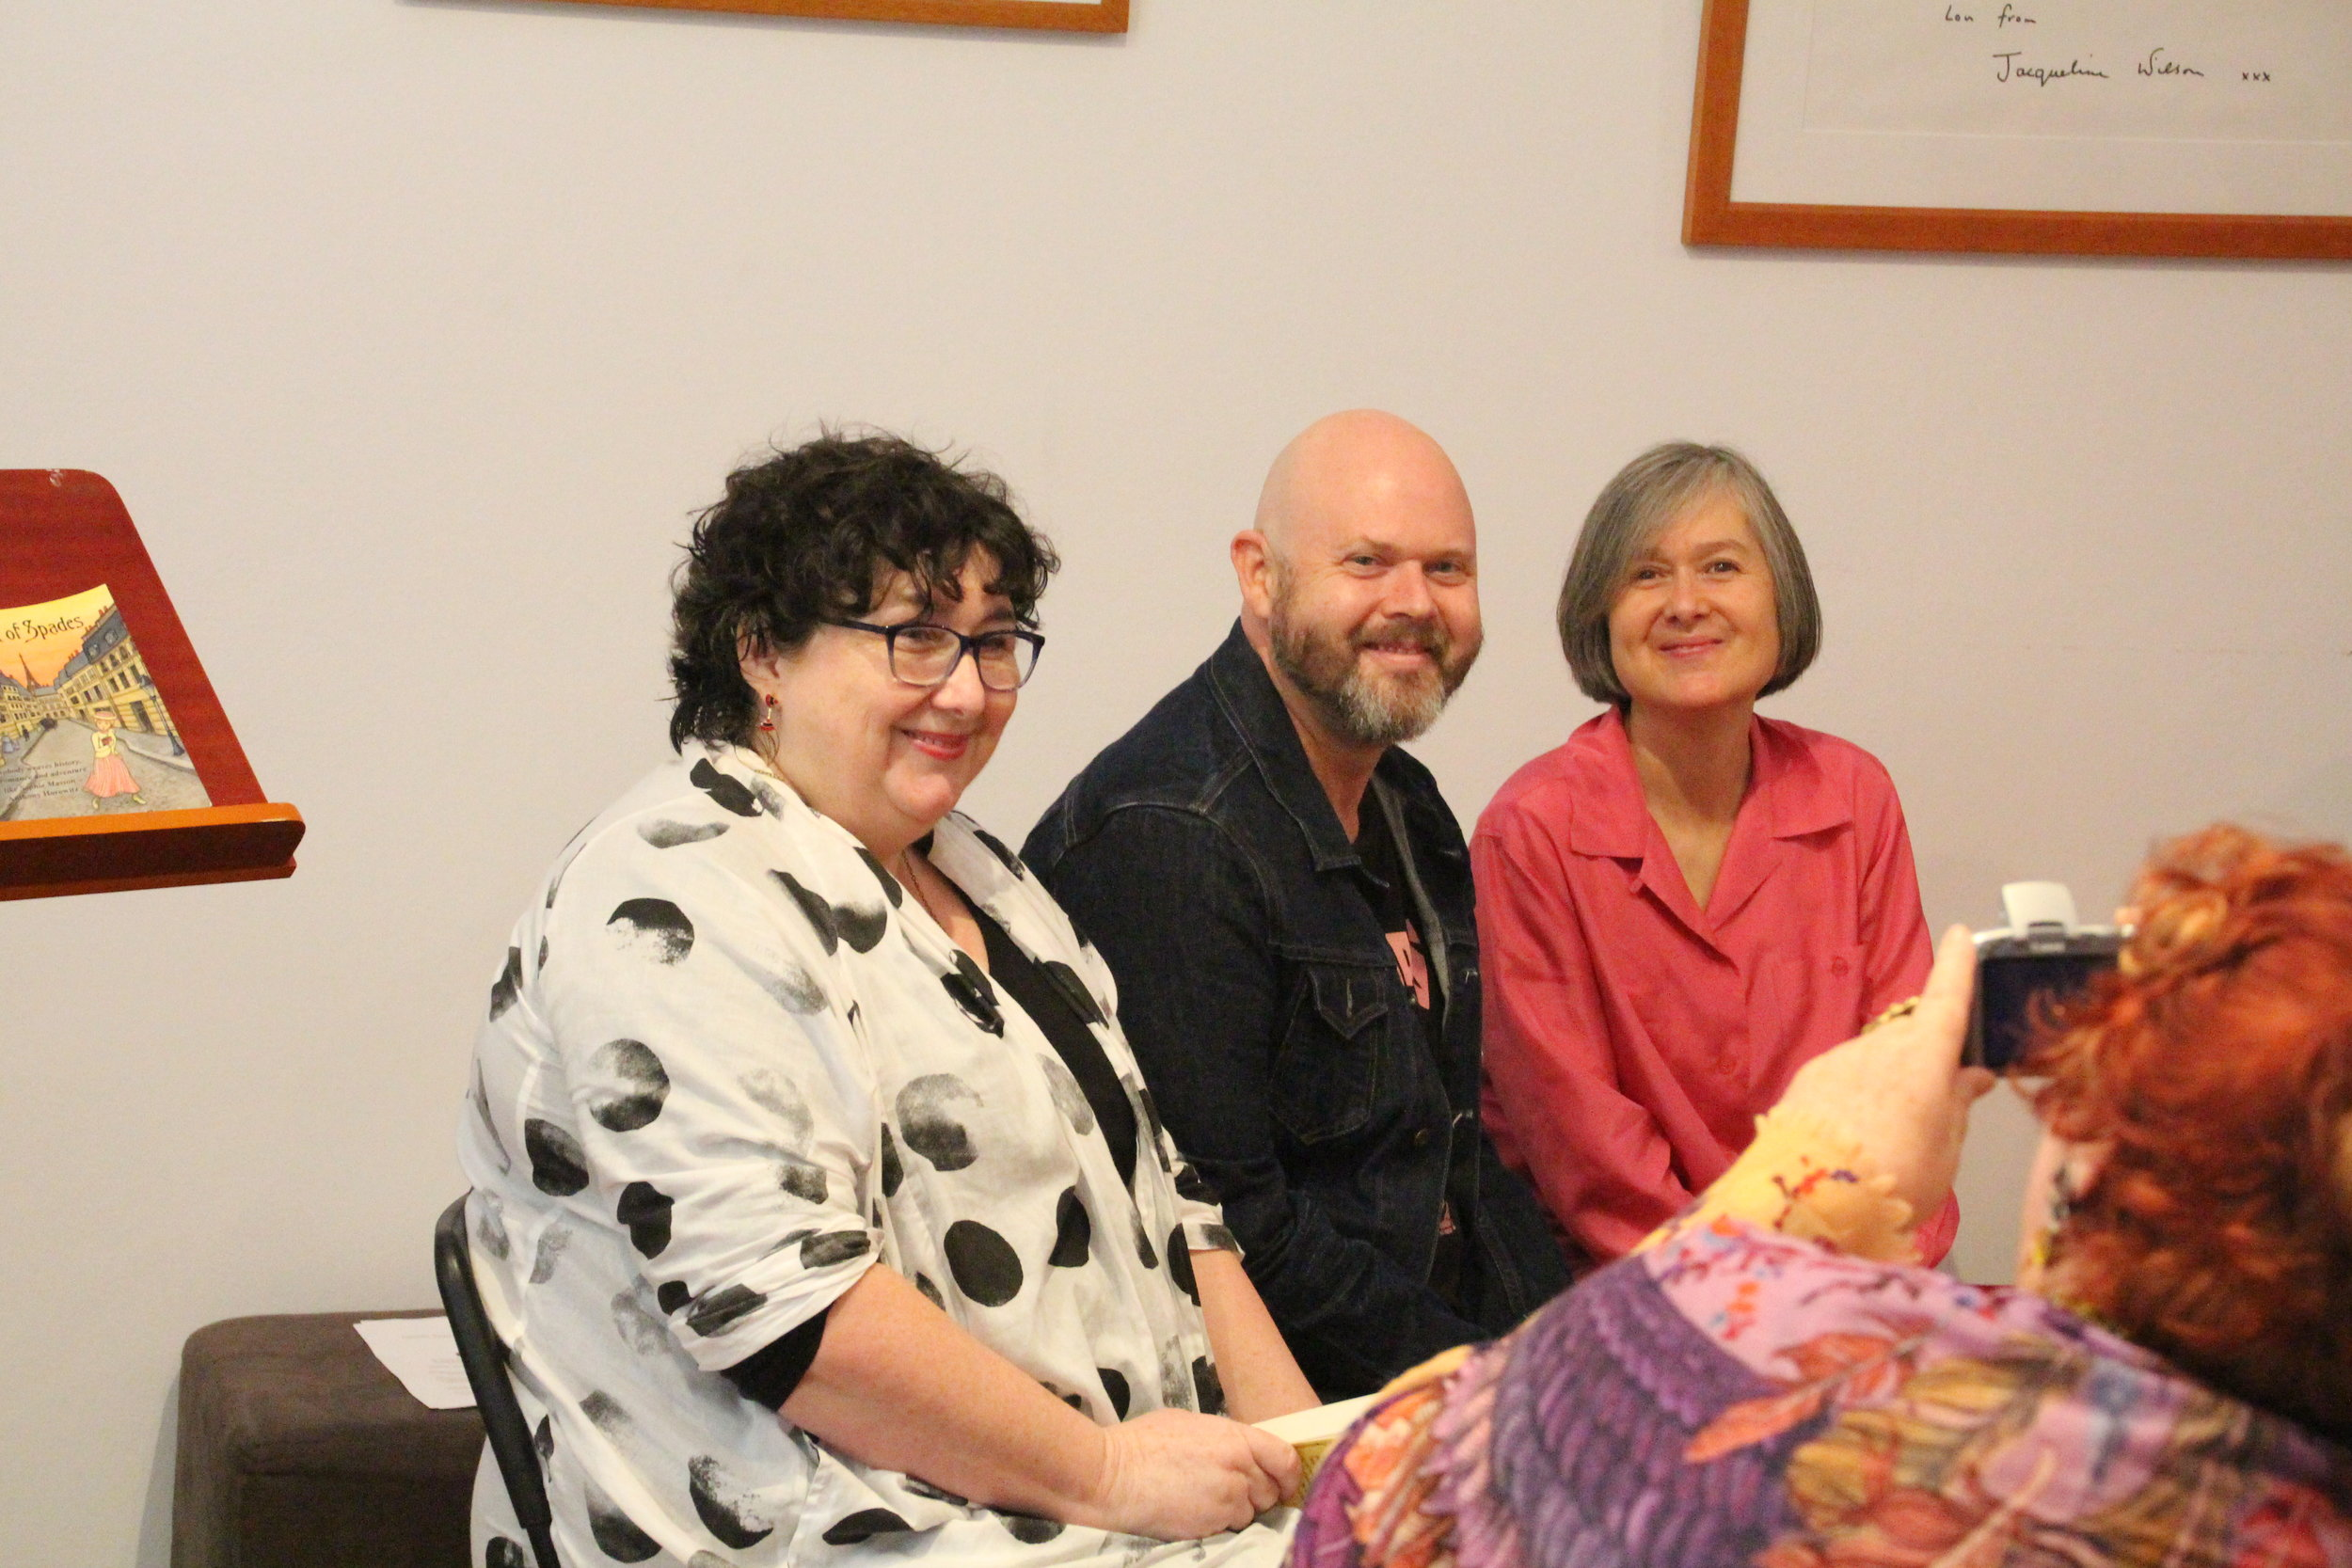 Pamela Freeman, Chris Nielsen and me.